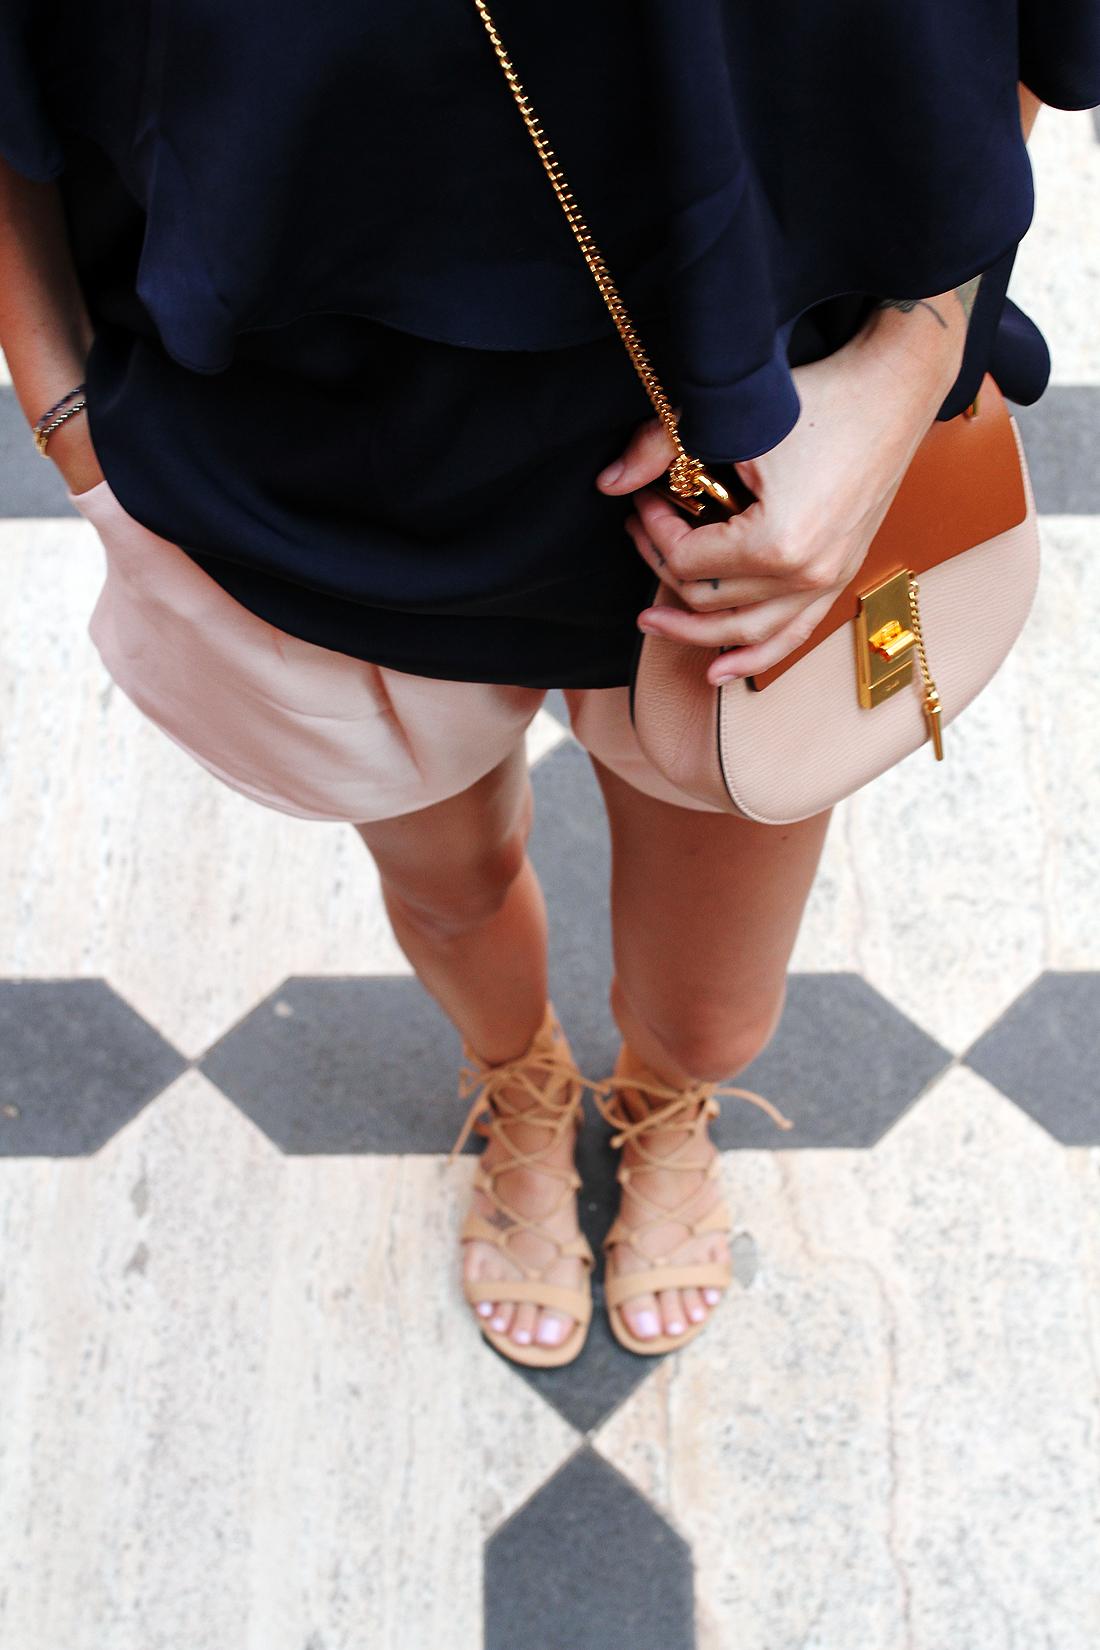 fashion-jackson-chloe-drew-colorblock-handbag-schutz-lace-up-gladiator-sandals